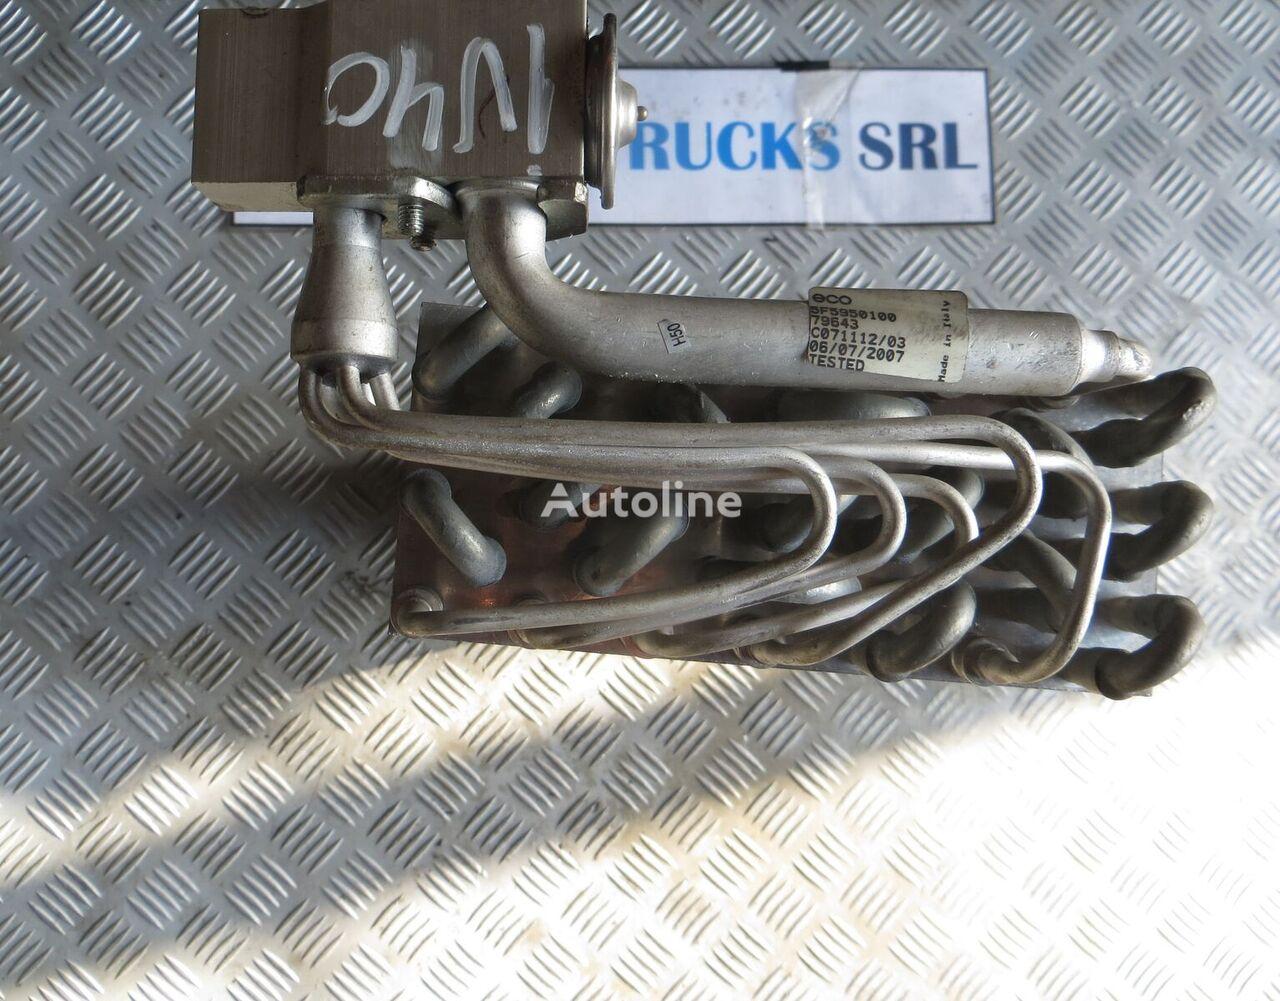 Radiator clima bord (SF5950100 D/124) radiador de aire acondicionado para IVECO Stralis tractora